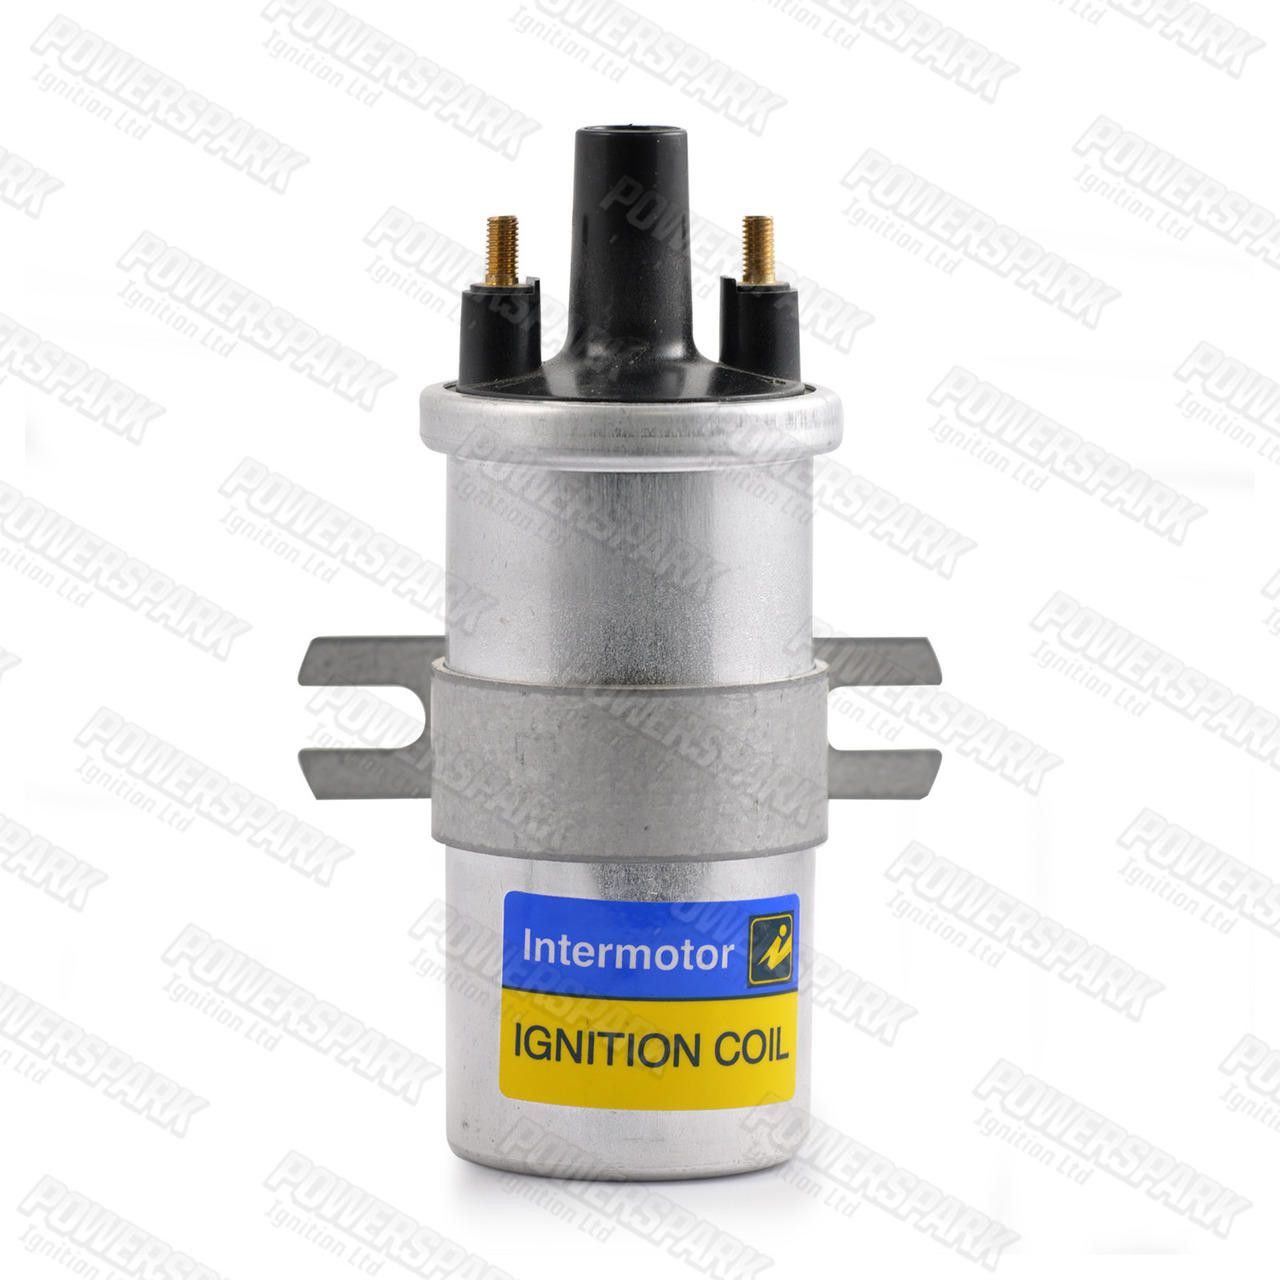 Intermotor Intermotor Ignition Coil 11000 Screw Top